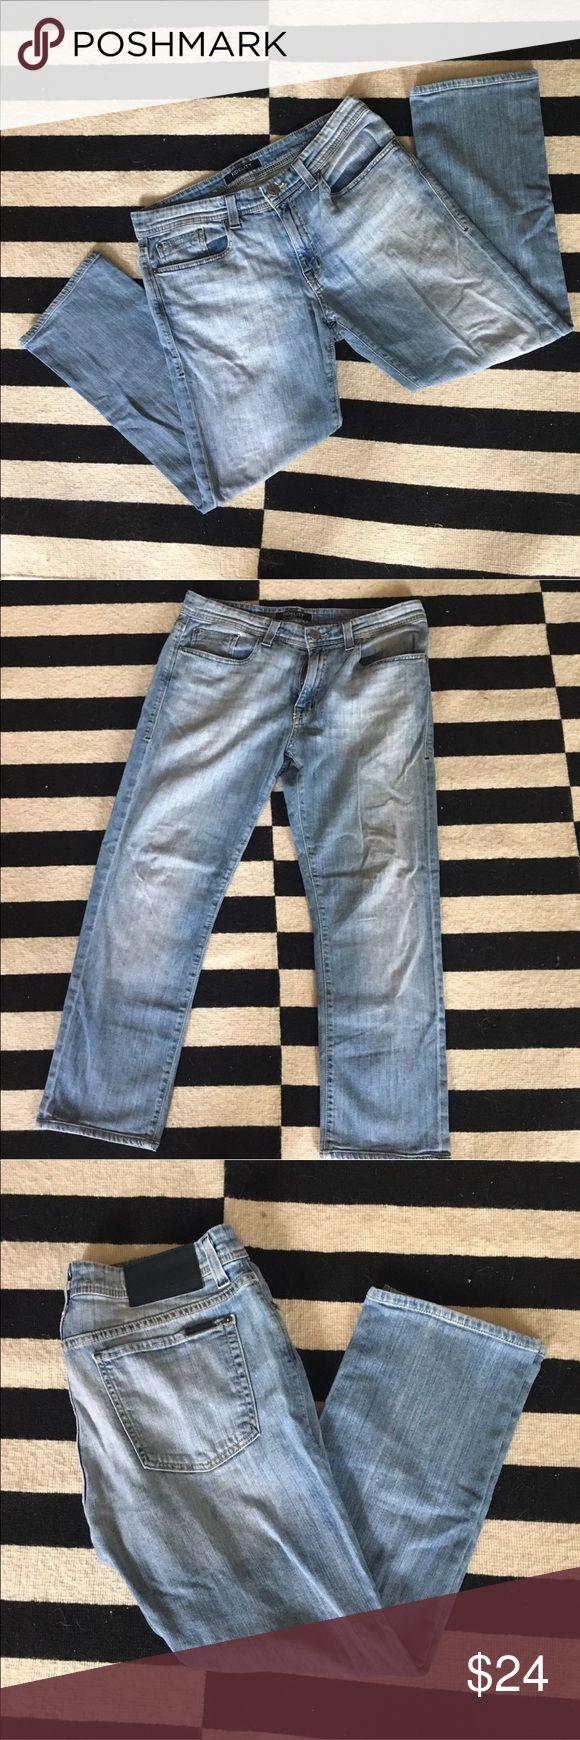 83 Best Pants For Women Images On Pinterest Woman Fashion Eagle Stallion Sepatu Jogging Grey Beige 41 Fidelity Jimmy Jeans Womens 32 Size Waist Approx 17